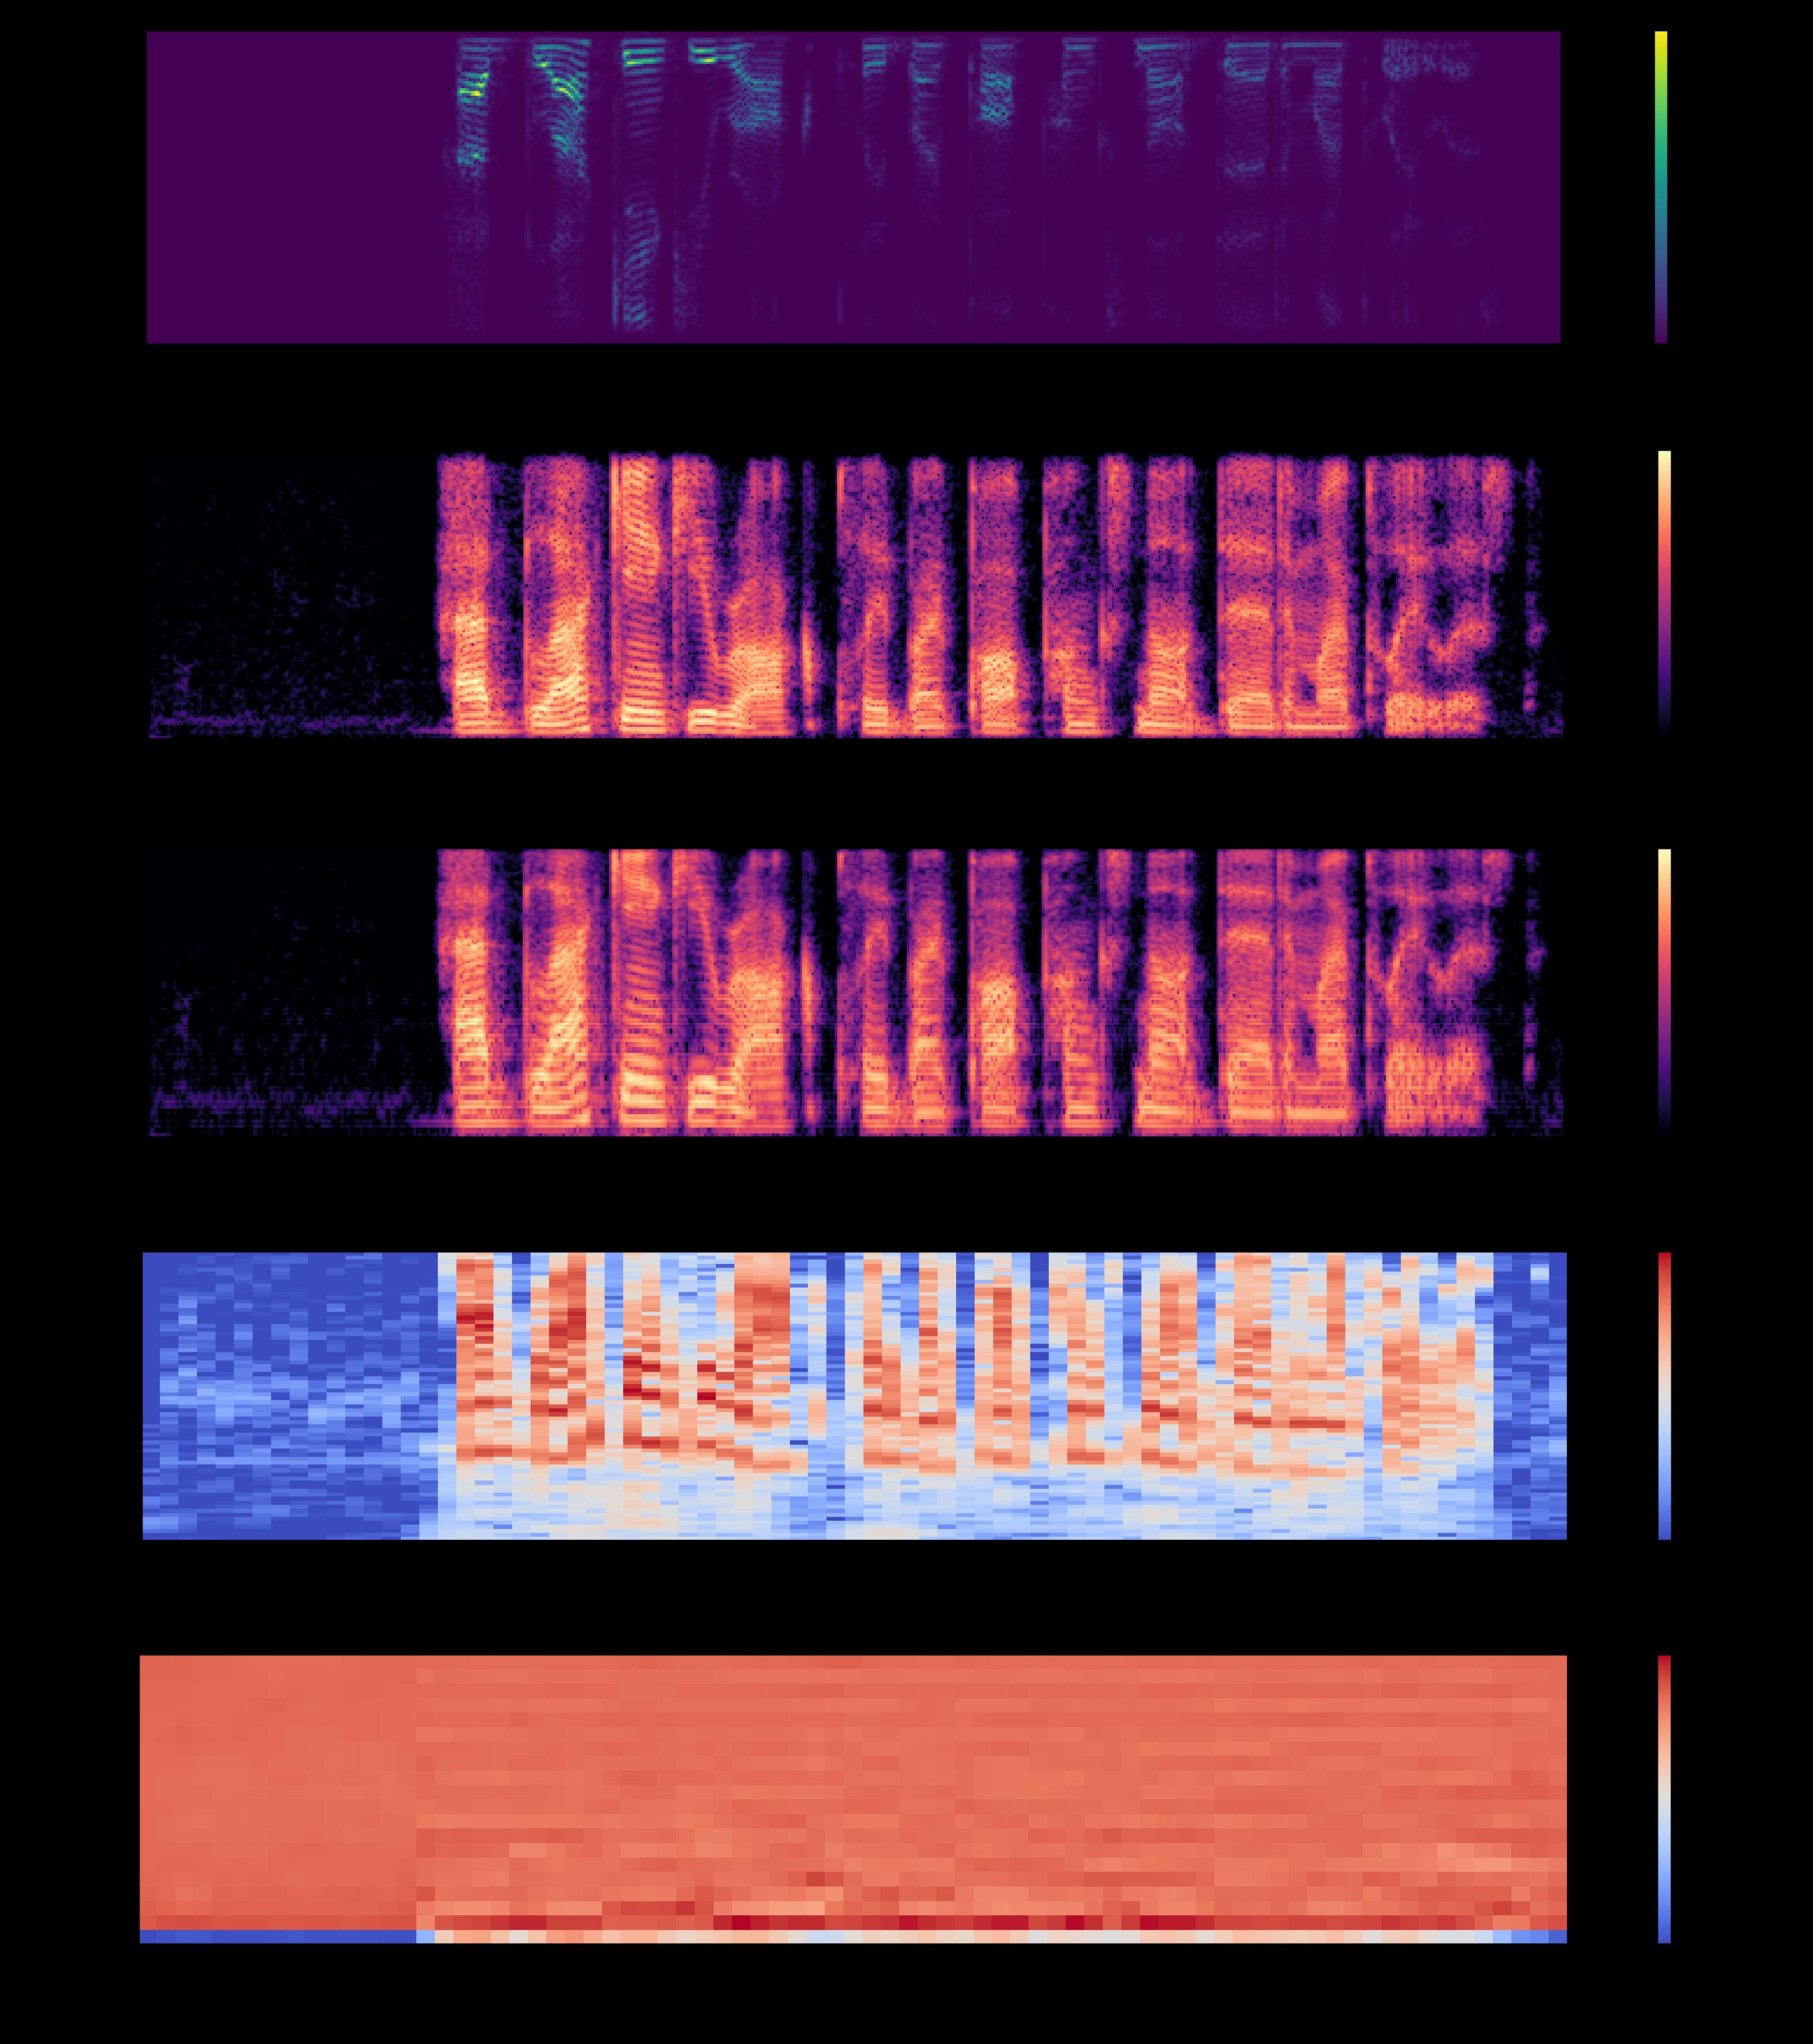 Audio time series plot